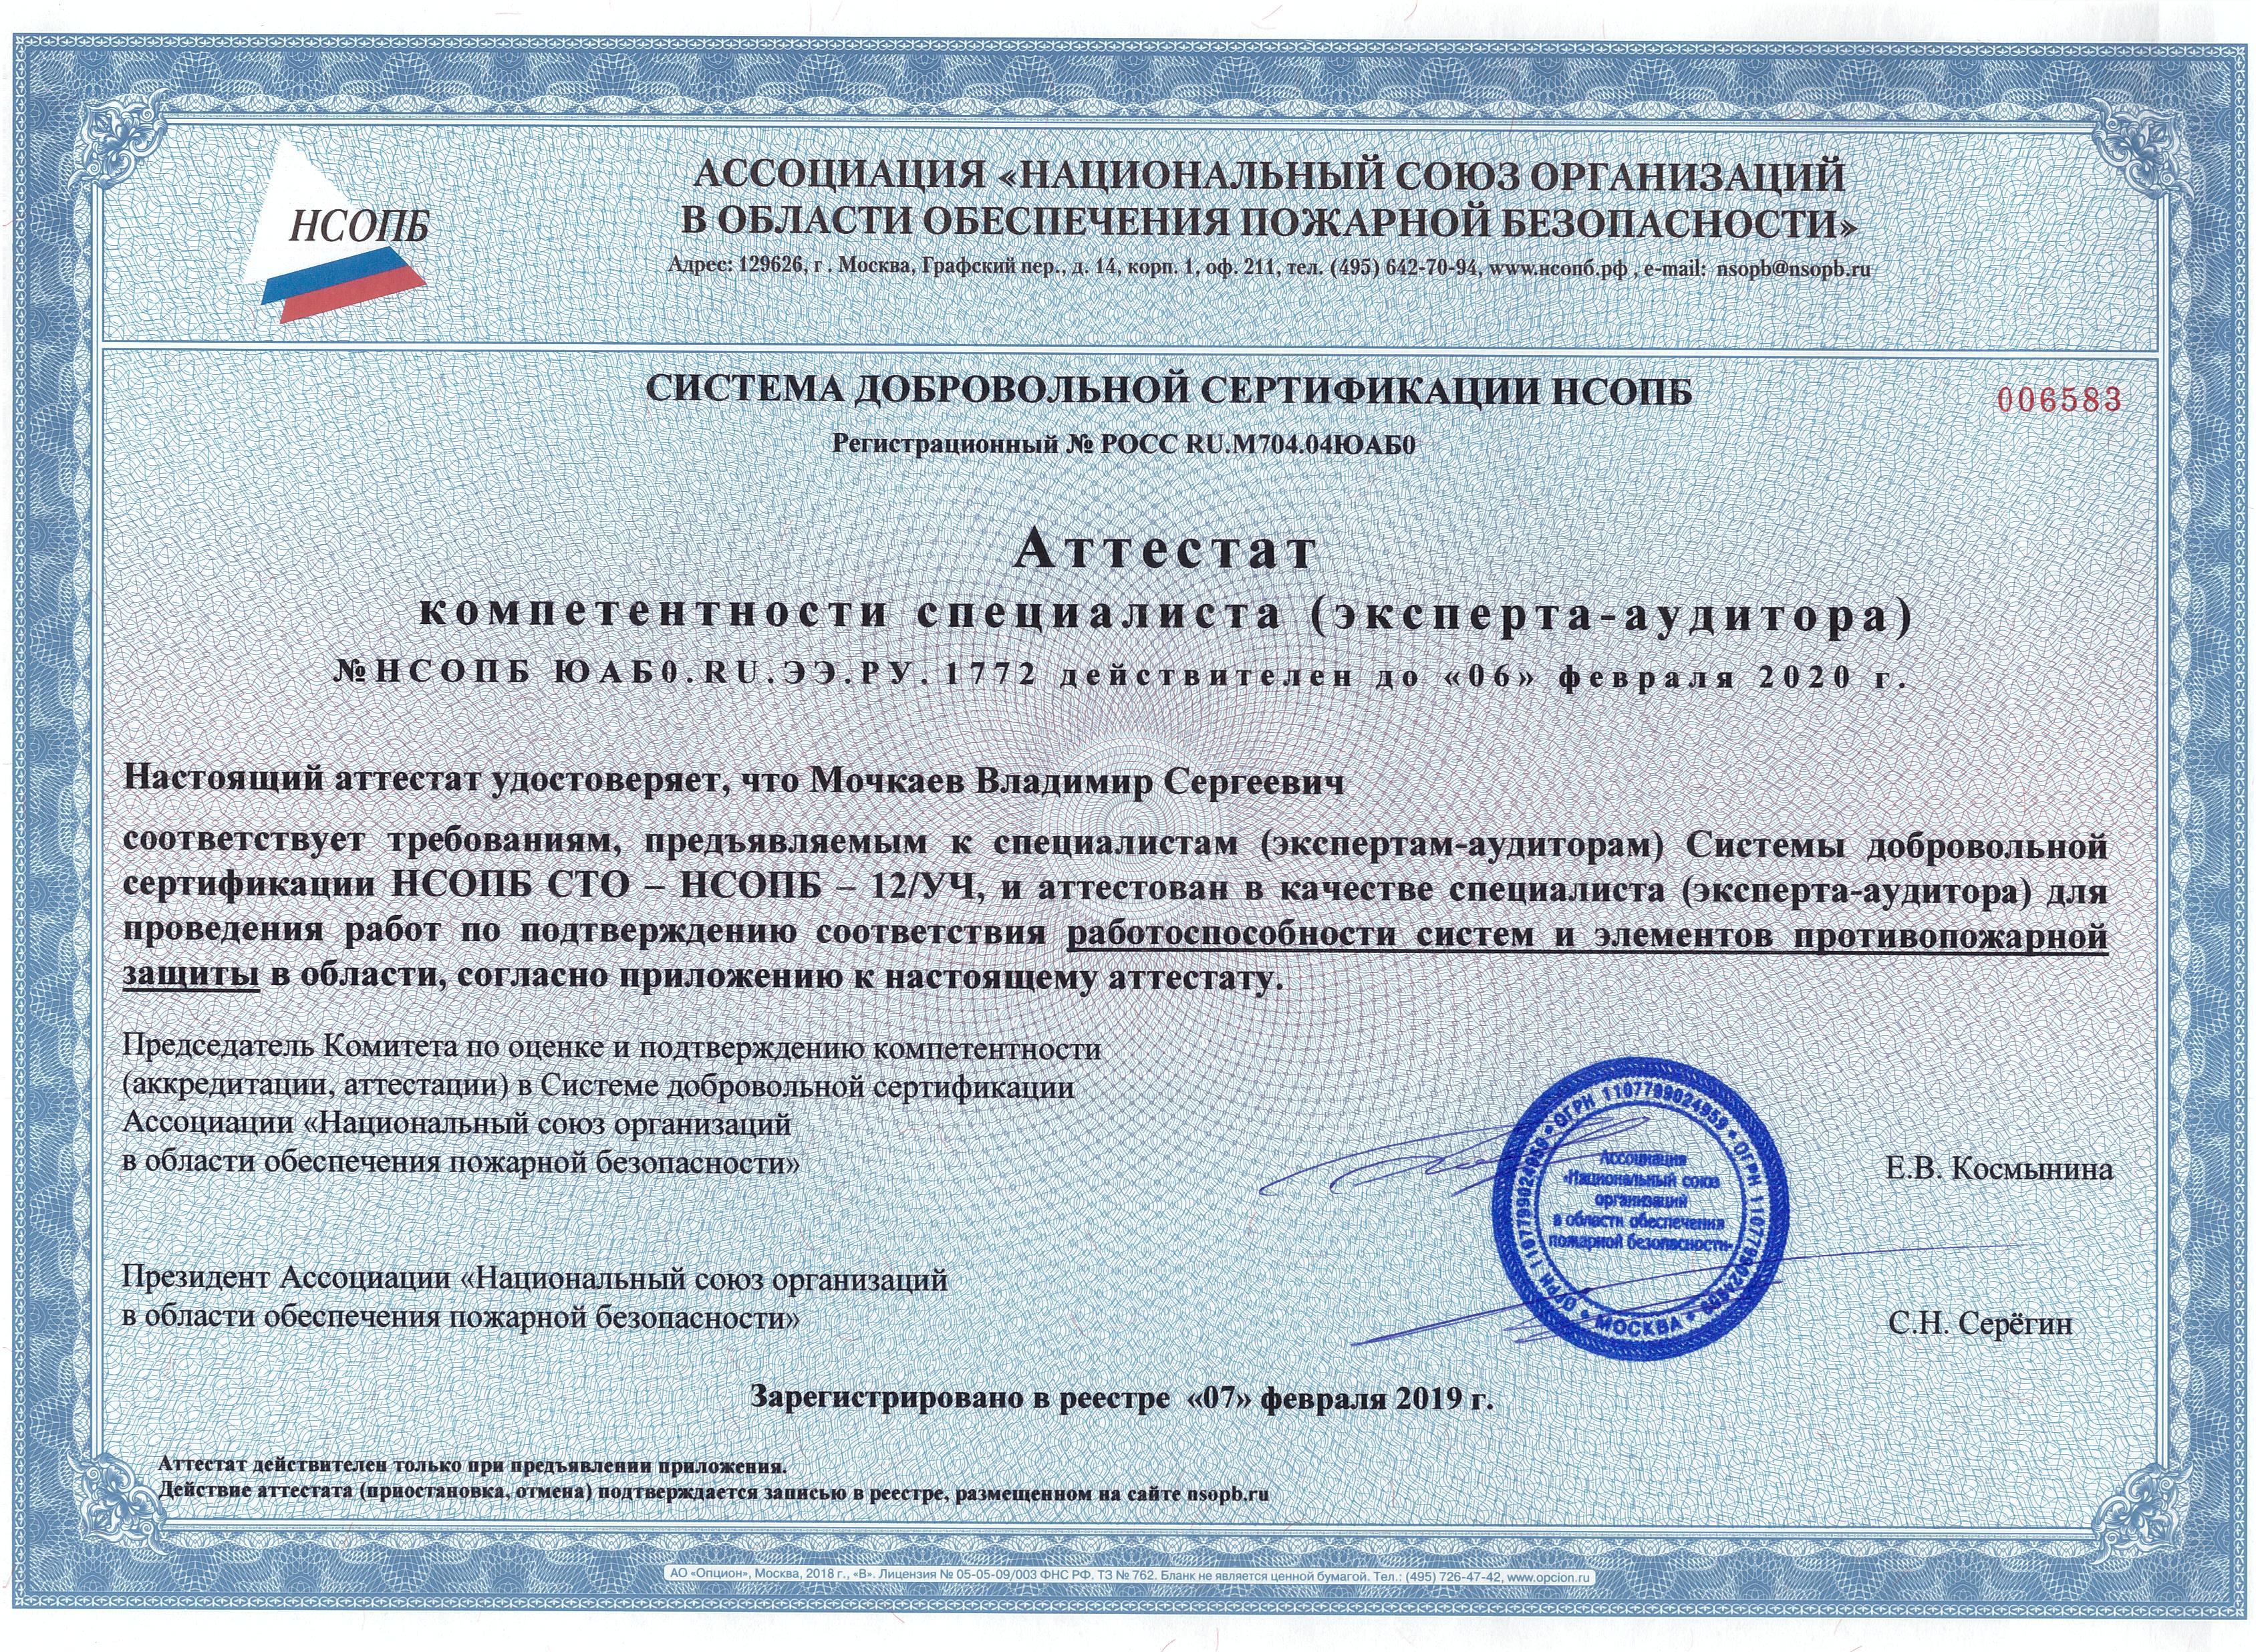 аттестат компетентности эксперта аудитора в системе НСОПБ